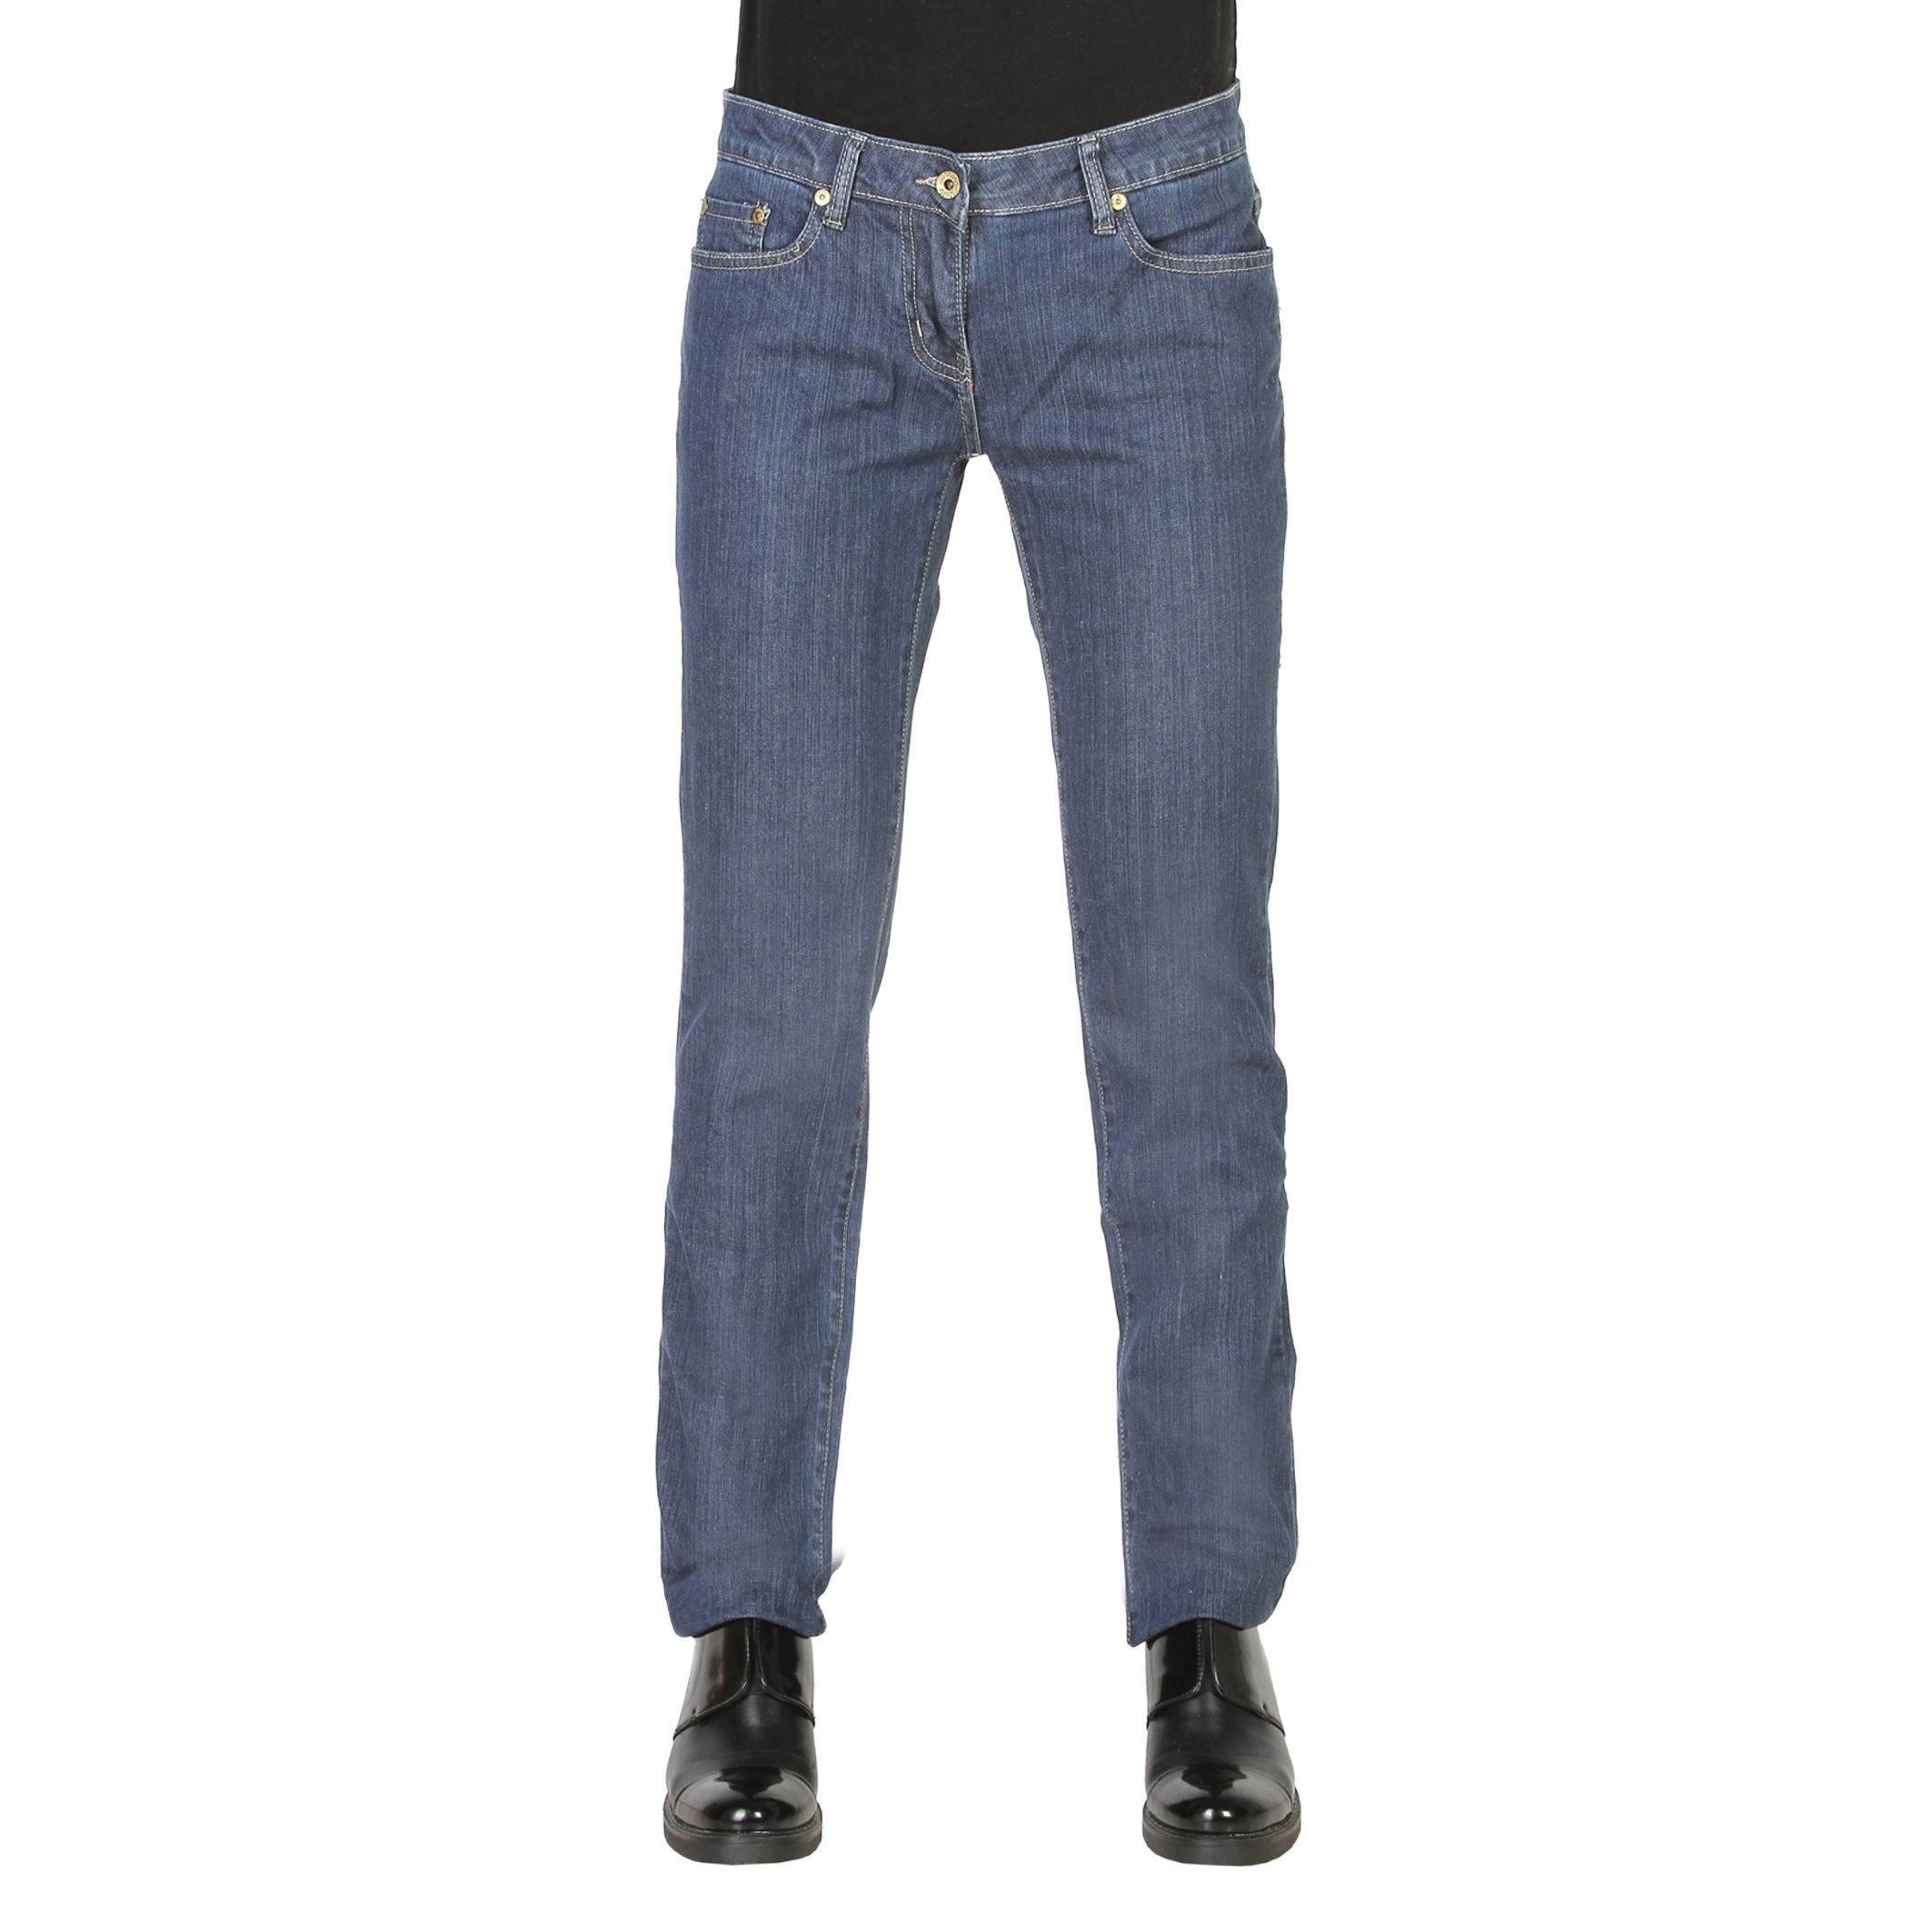 Jeans   Carrera Jeans 000760_960AA blue